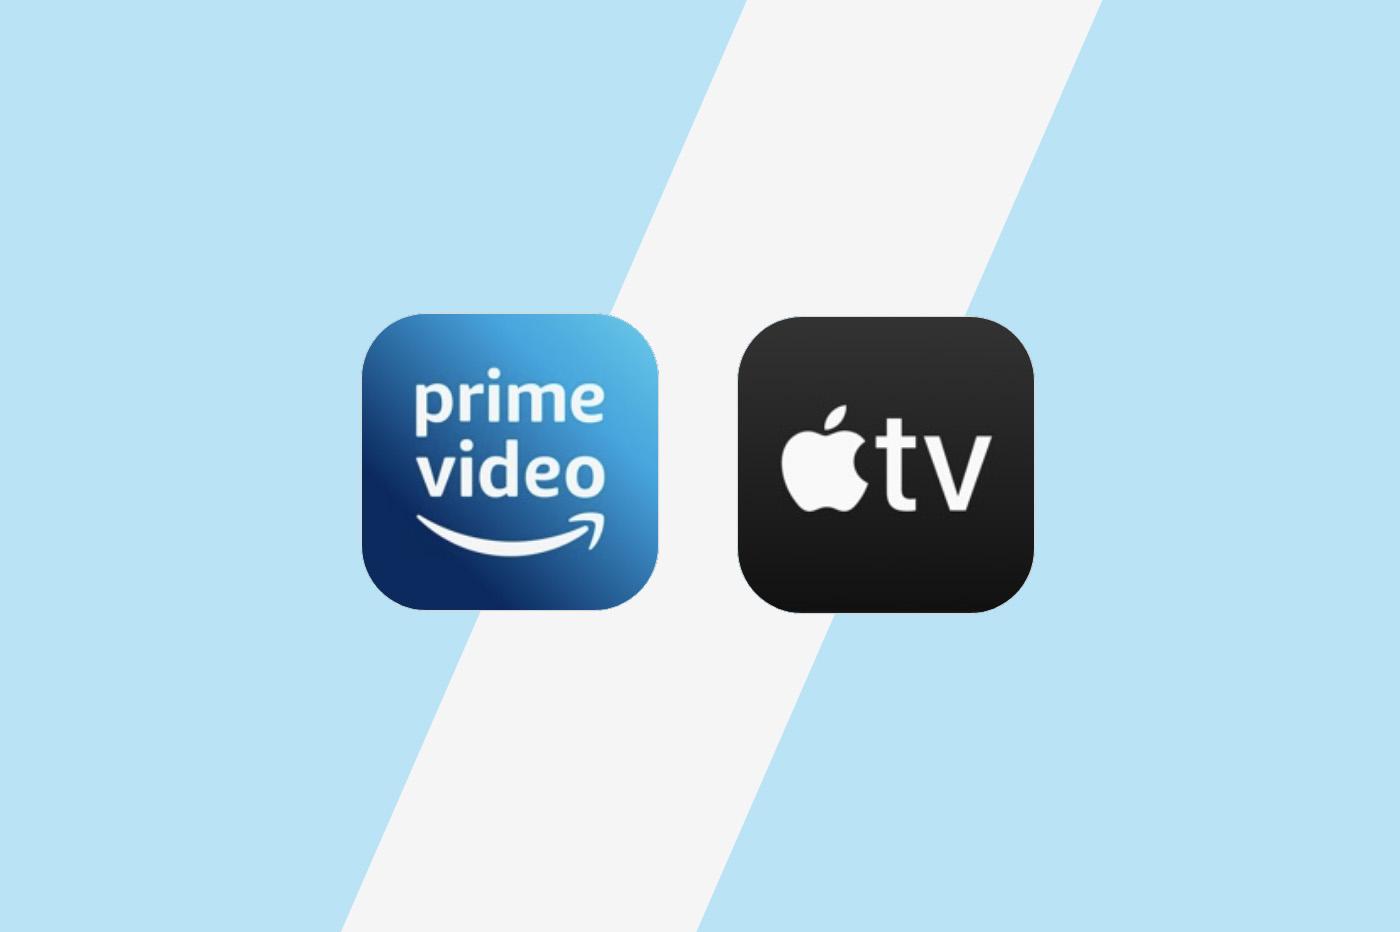 Comparatif Amazon prime Video vs Apple Tv+